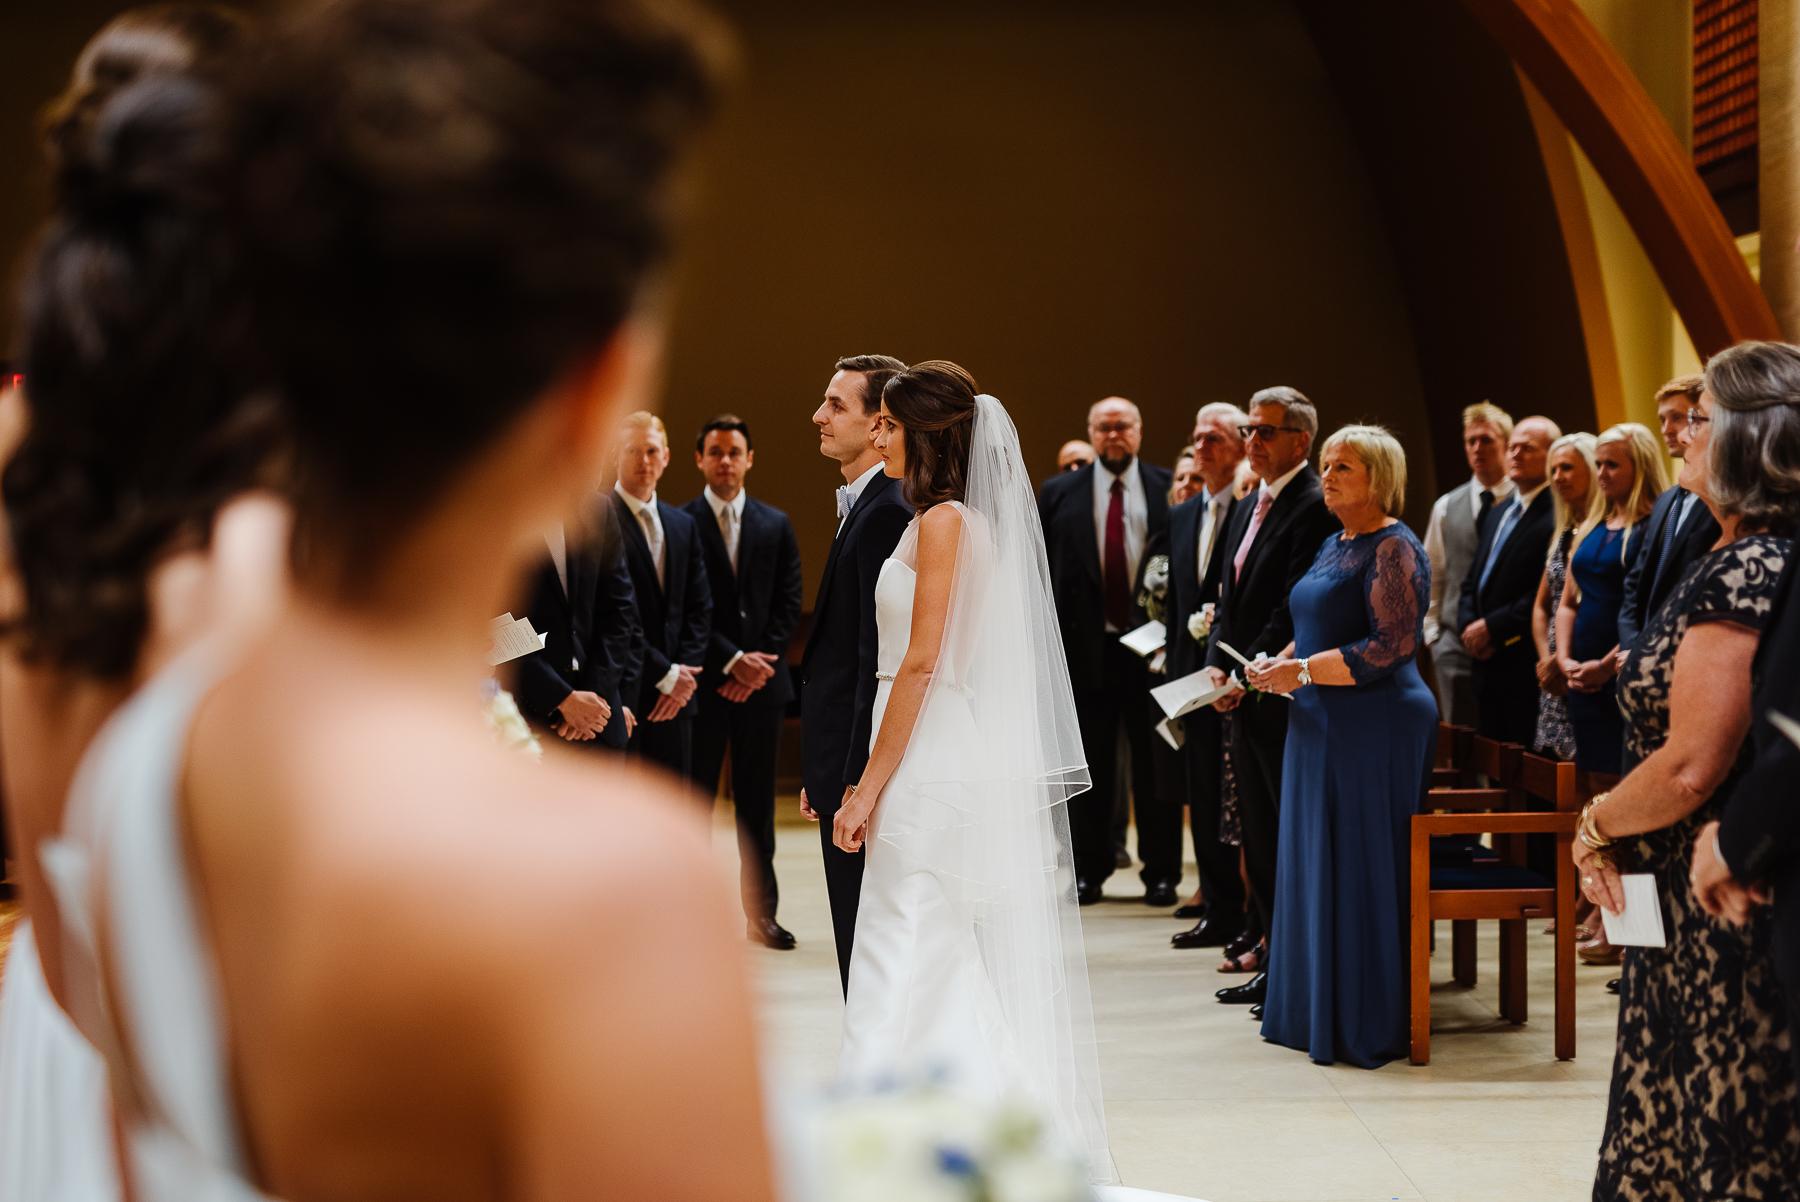 41-J Crew Wedding New Jersey Wedding Photographer J Crew Weddings.jpg